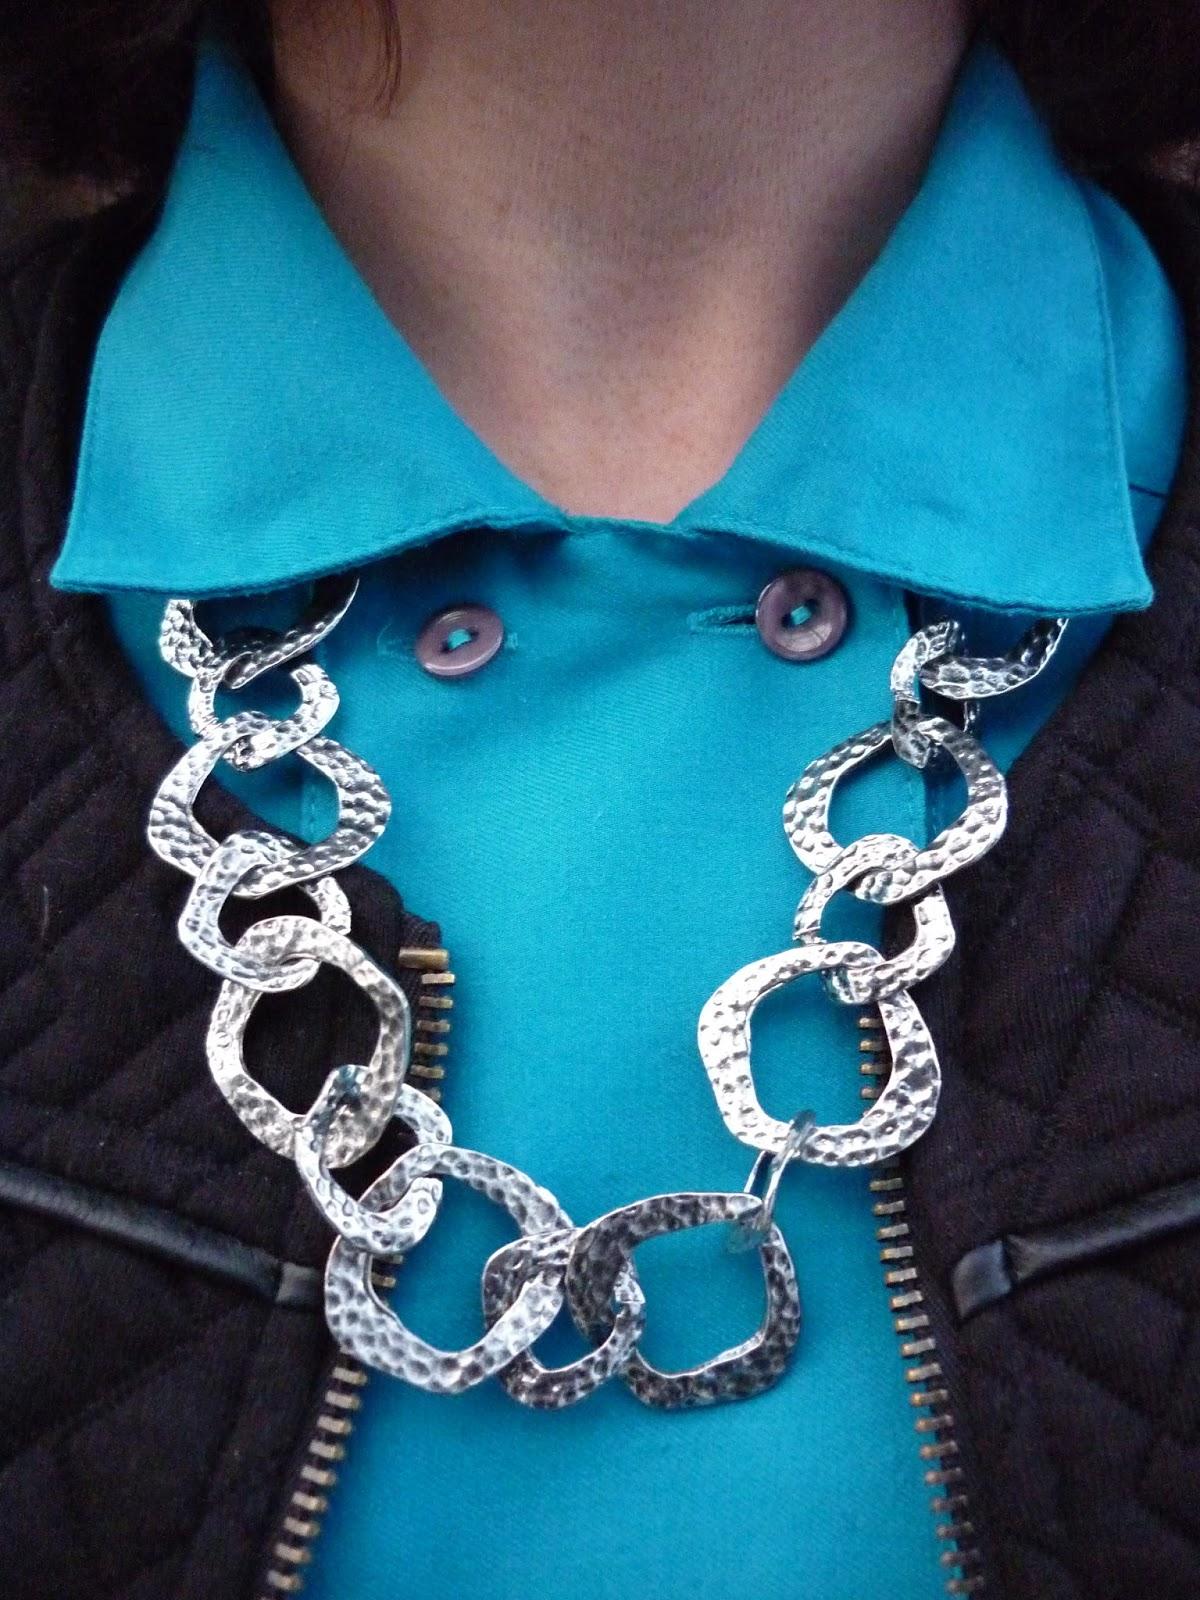 Camaieu Jacket, Marks & Spencer Turquoise Shirt, Hammered Silver Necklace | Petite Silver Vixen